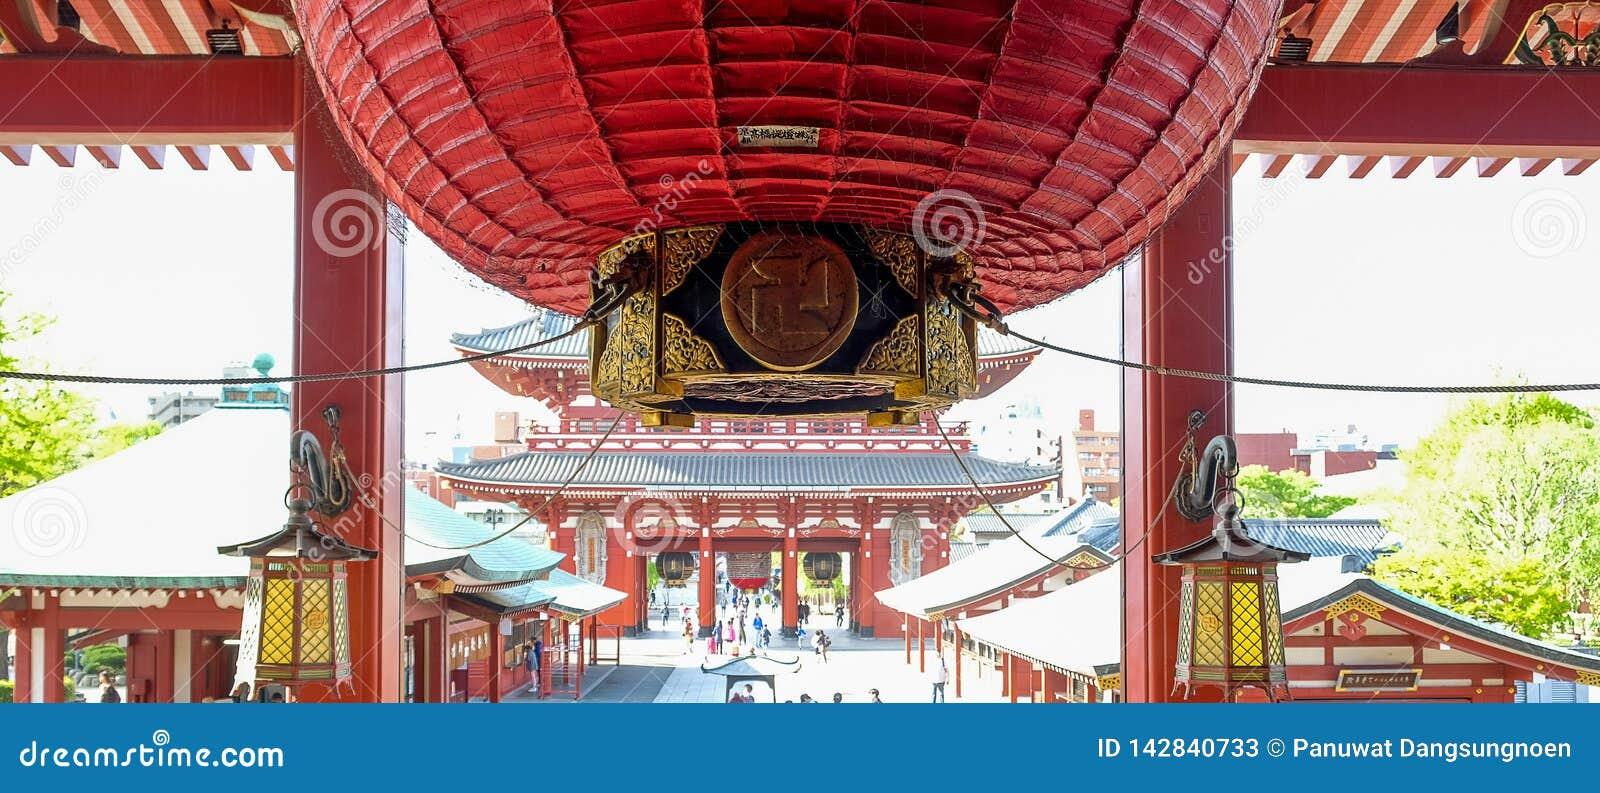 Sensoji or Asakusa Kannon Temple is a Buddhist temple located in Asakusa, landmark and popular for tourist attractions. 7 April 20